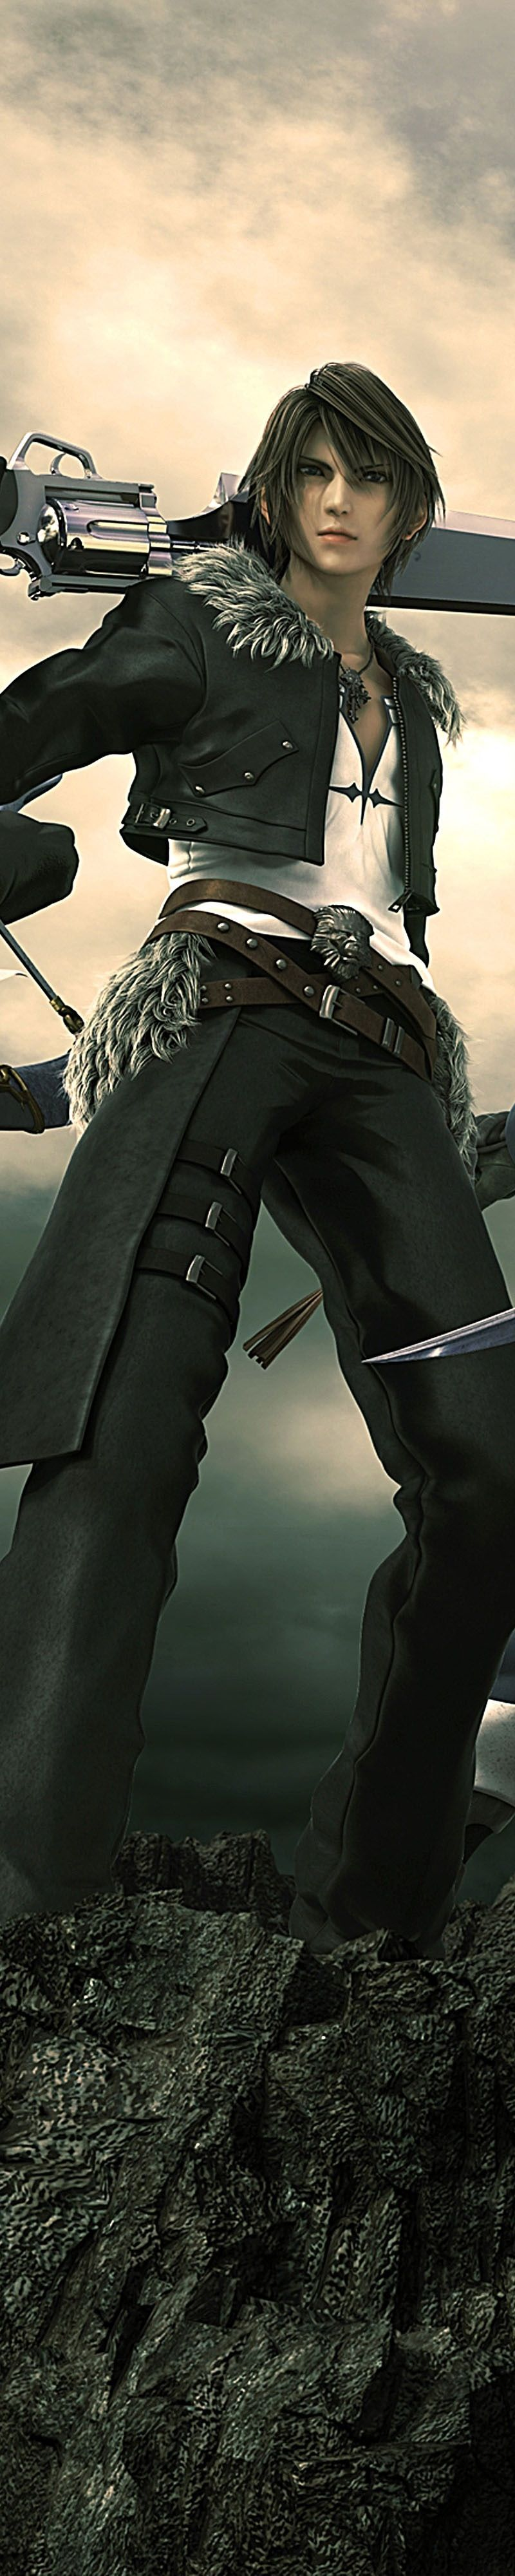 Squall Leonhart. Official poster. Final Fantasy Dissidia/Final Fantasy VIII.